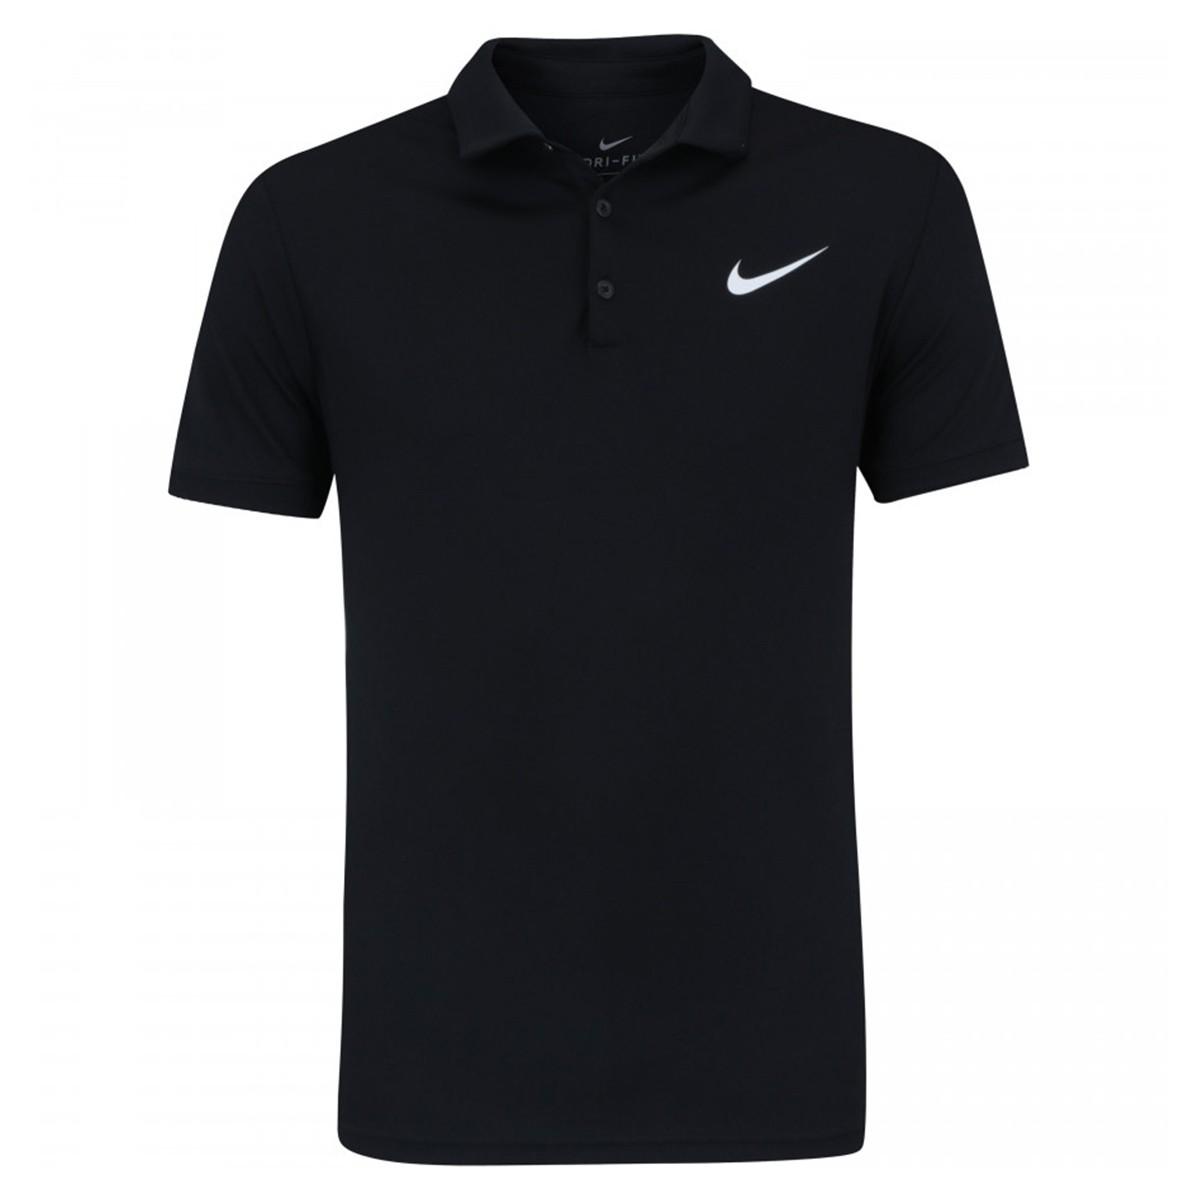 Camisa Polo Nike Dry Team - Preto - Masculina